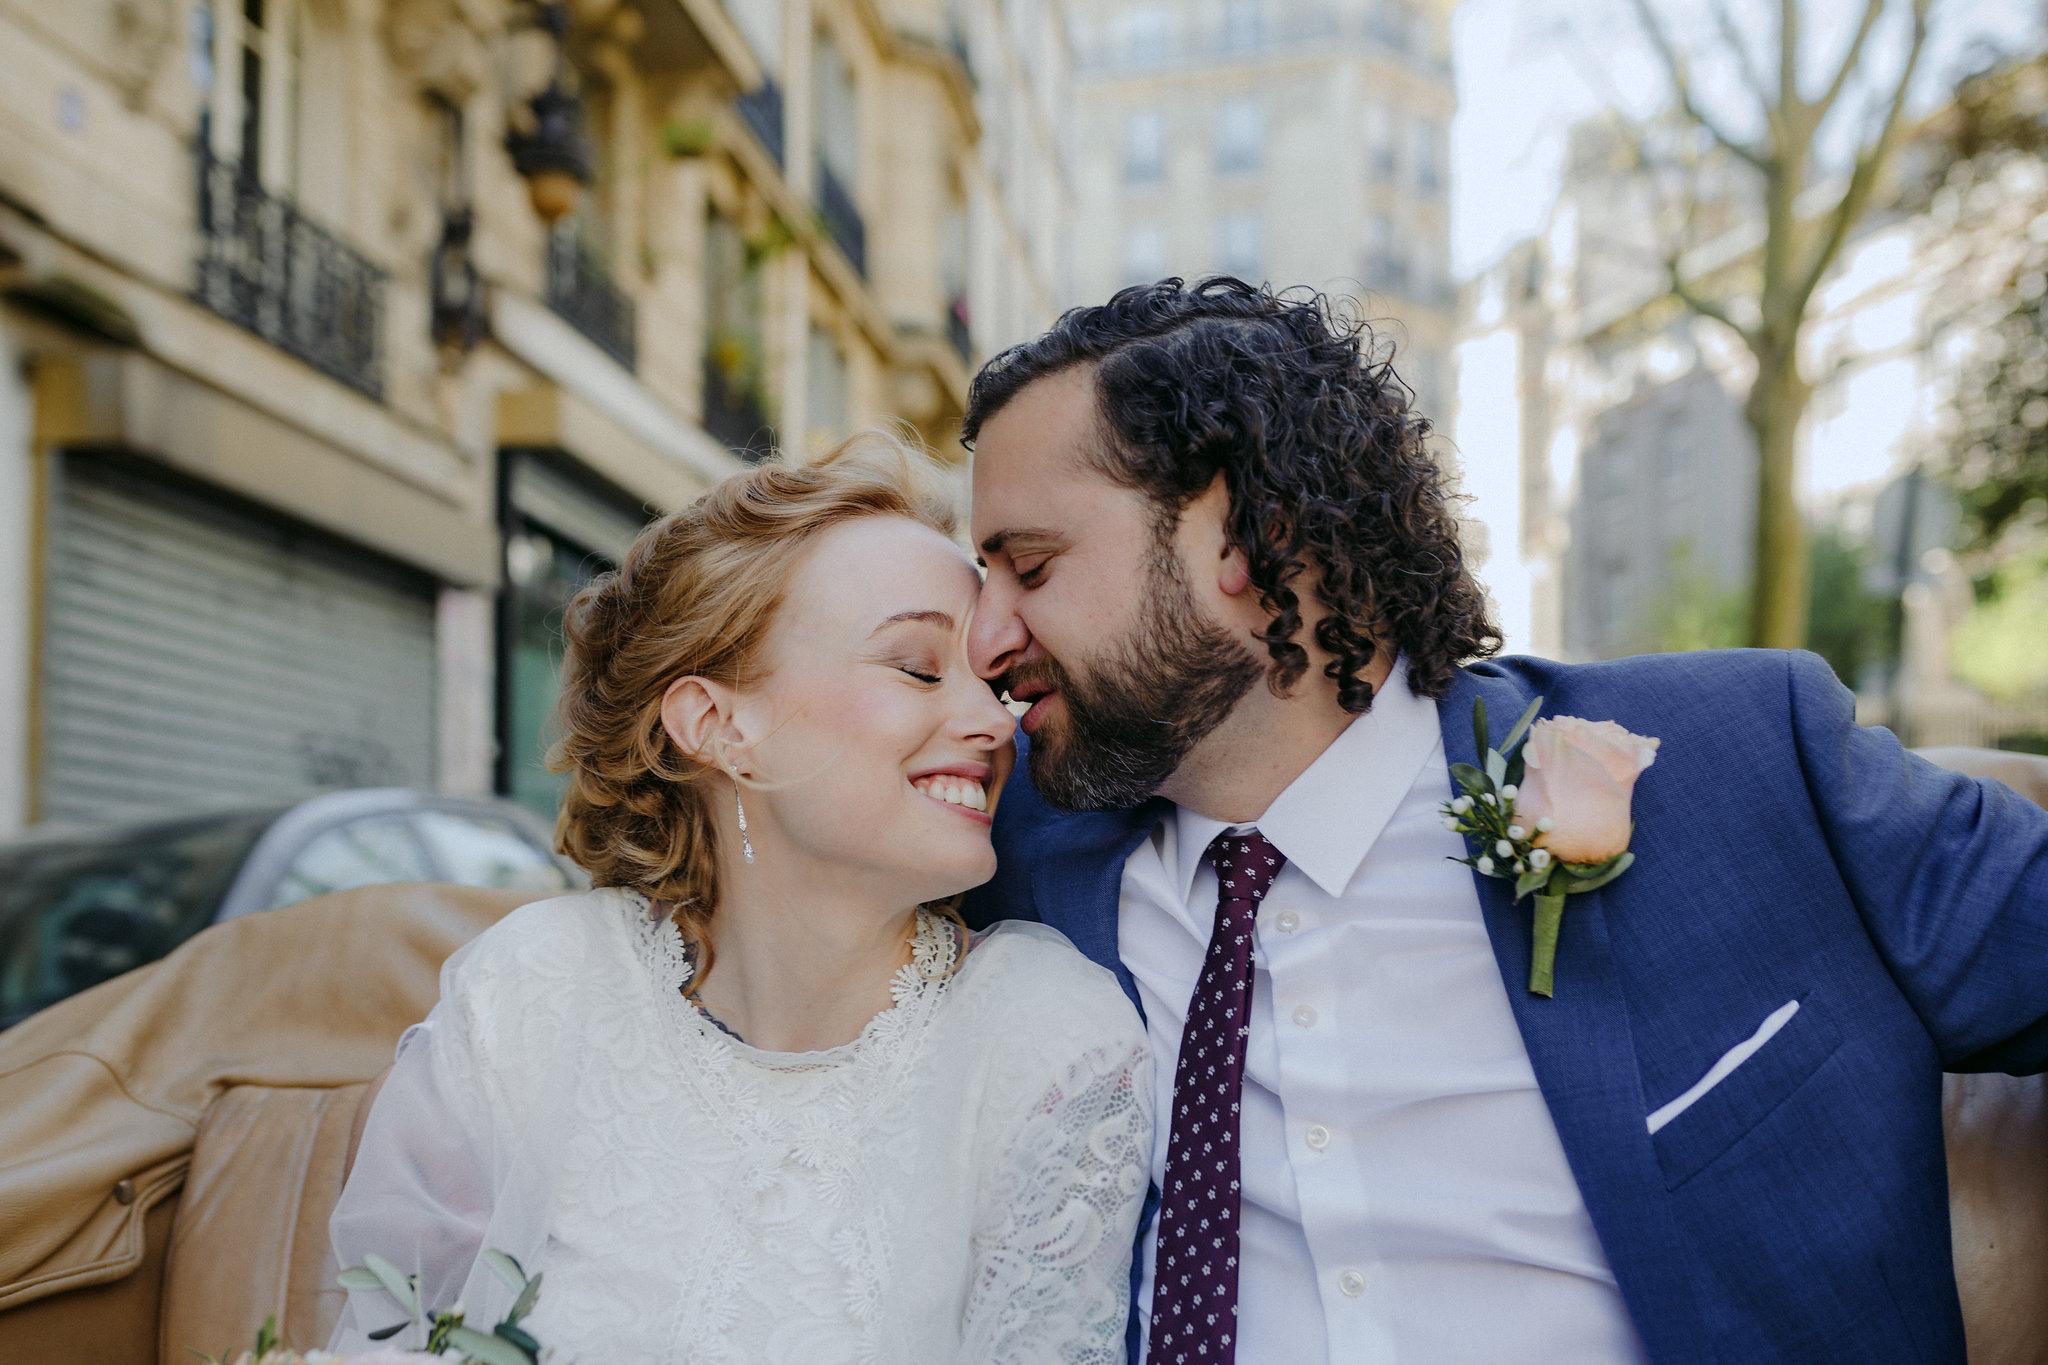 Paris_elopement_wedding_photographer-243.jpg